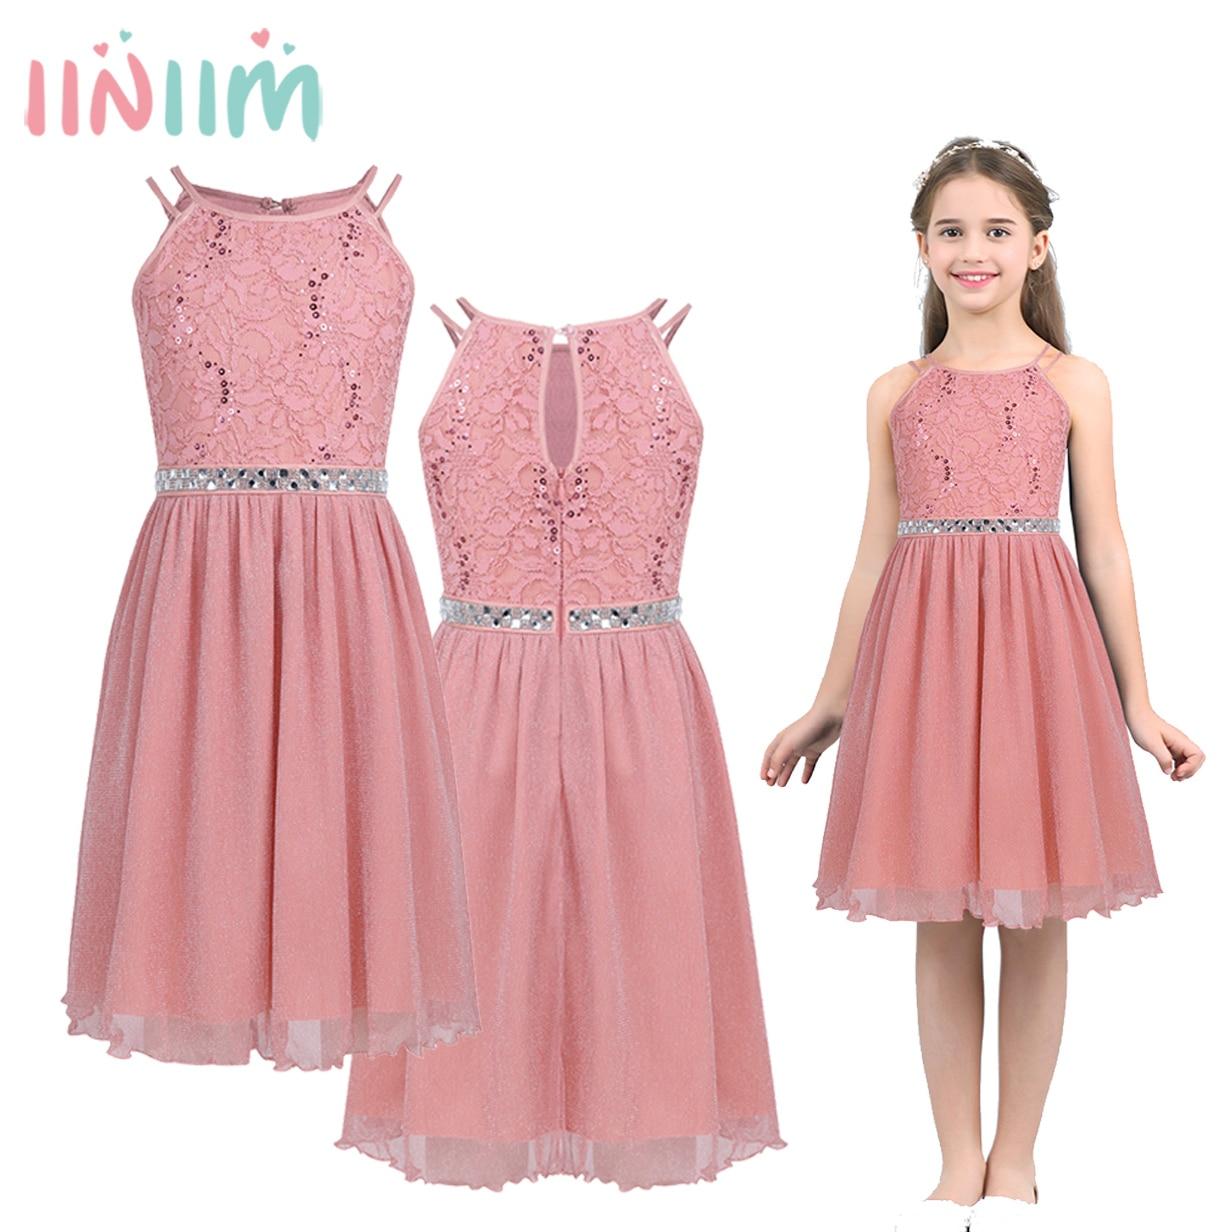 iiniim Teen Girls Sleeveless Sequined Floral Lace Shiny Dress Vestido de festa for Weeding Formal Birthday Party Summer Dresses 1